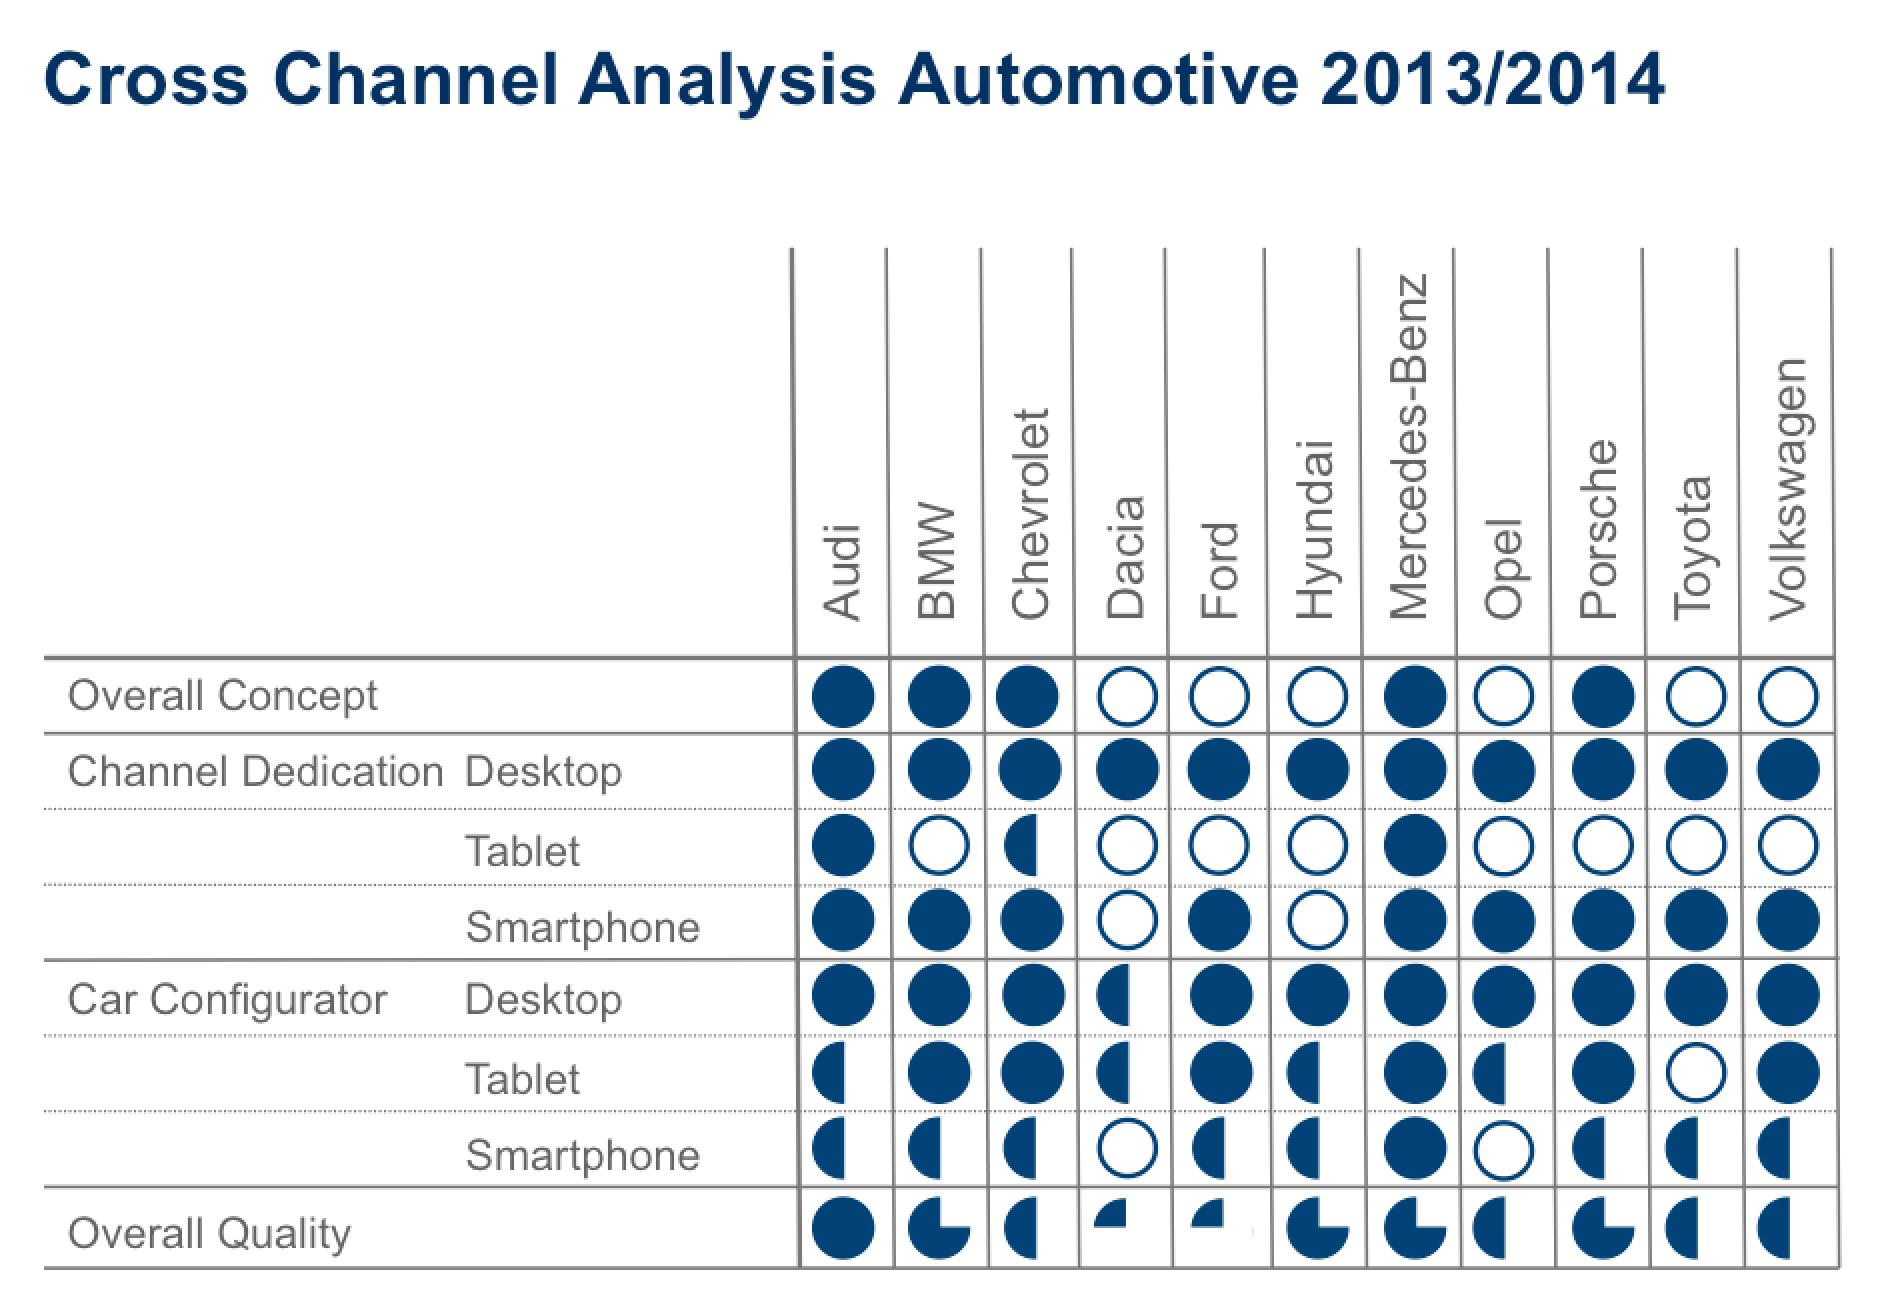 Cross Channel Analysis Automotive 2013/2014 (Volker Liedtke)